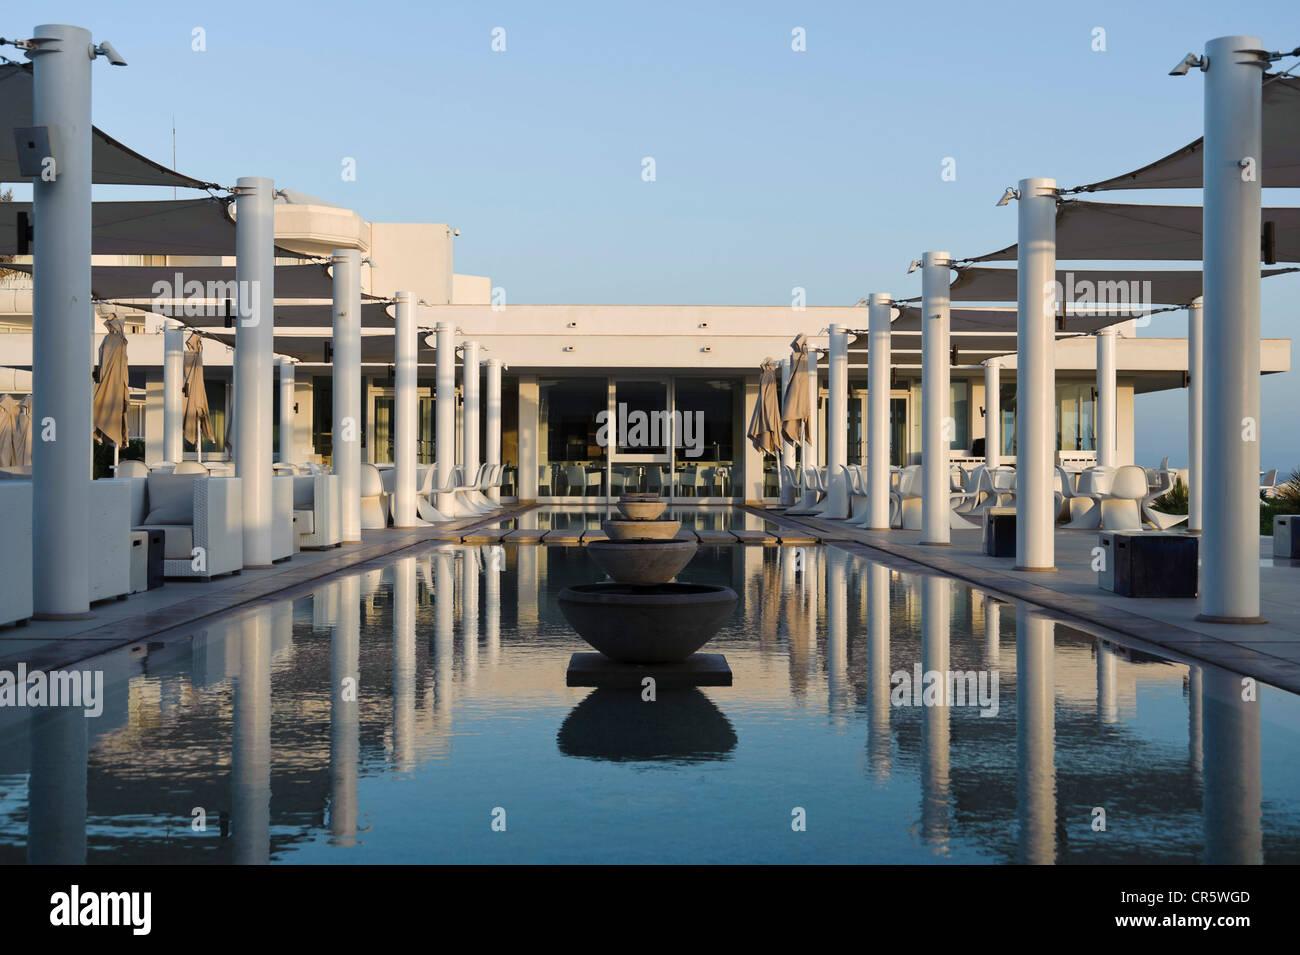 Radisson Blu hotel resort, Djerba, Tunisia, Maghreb, North Africa, Africa - Stock Image